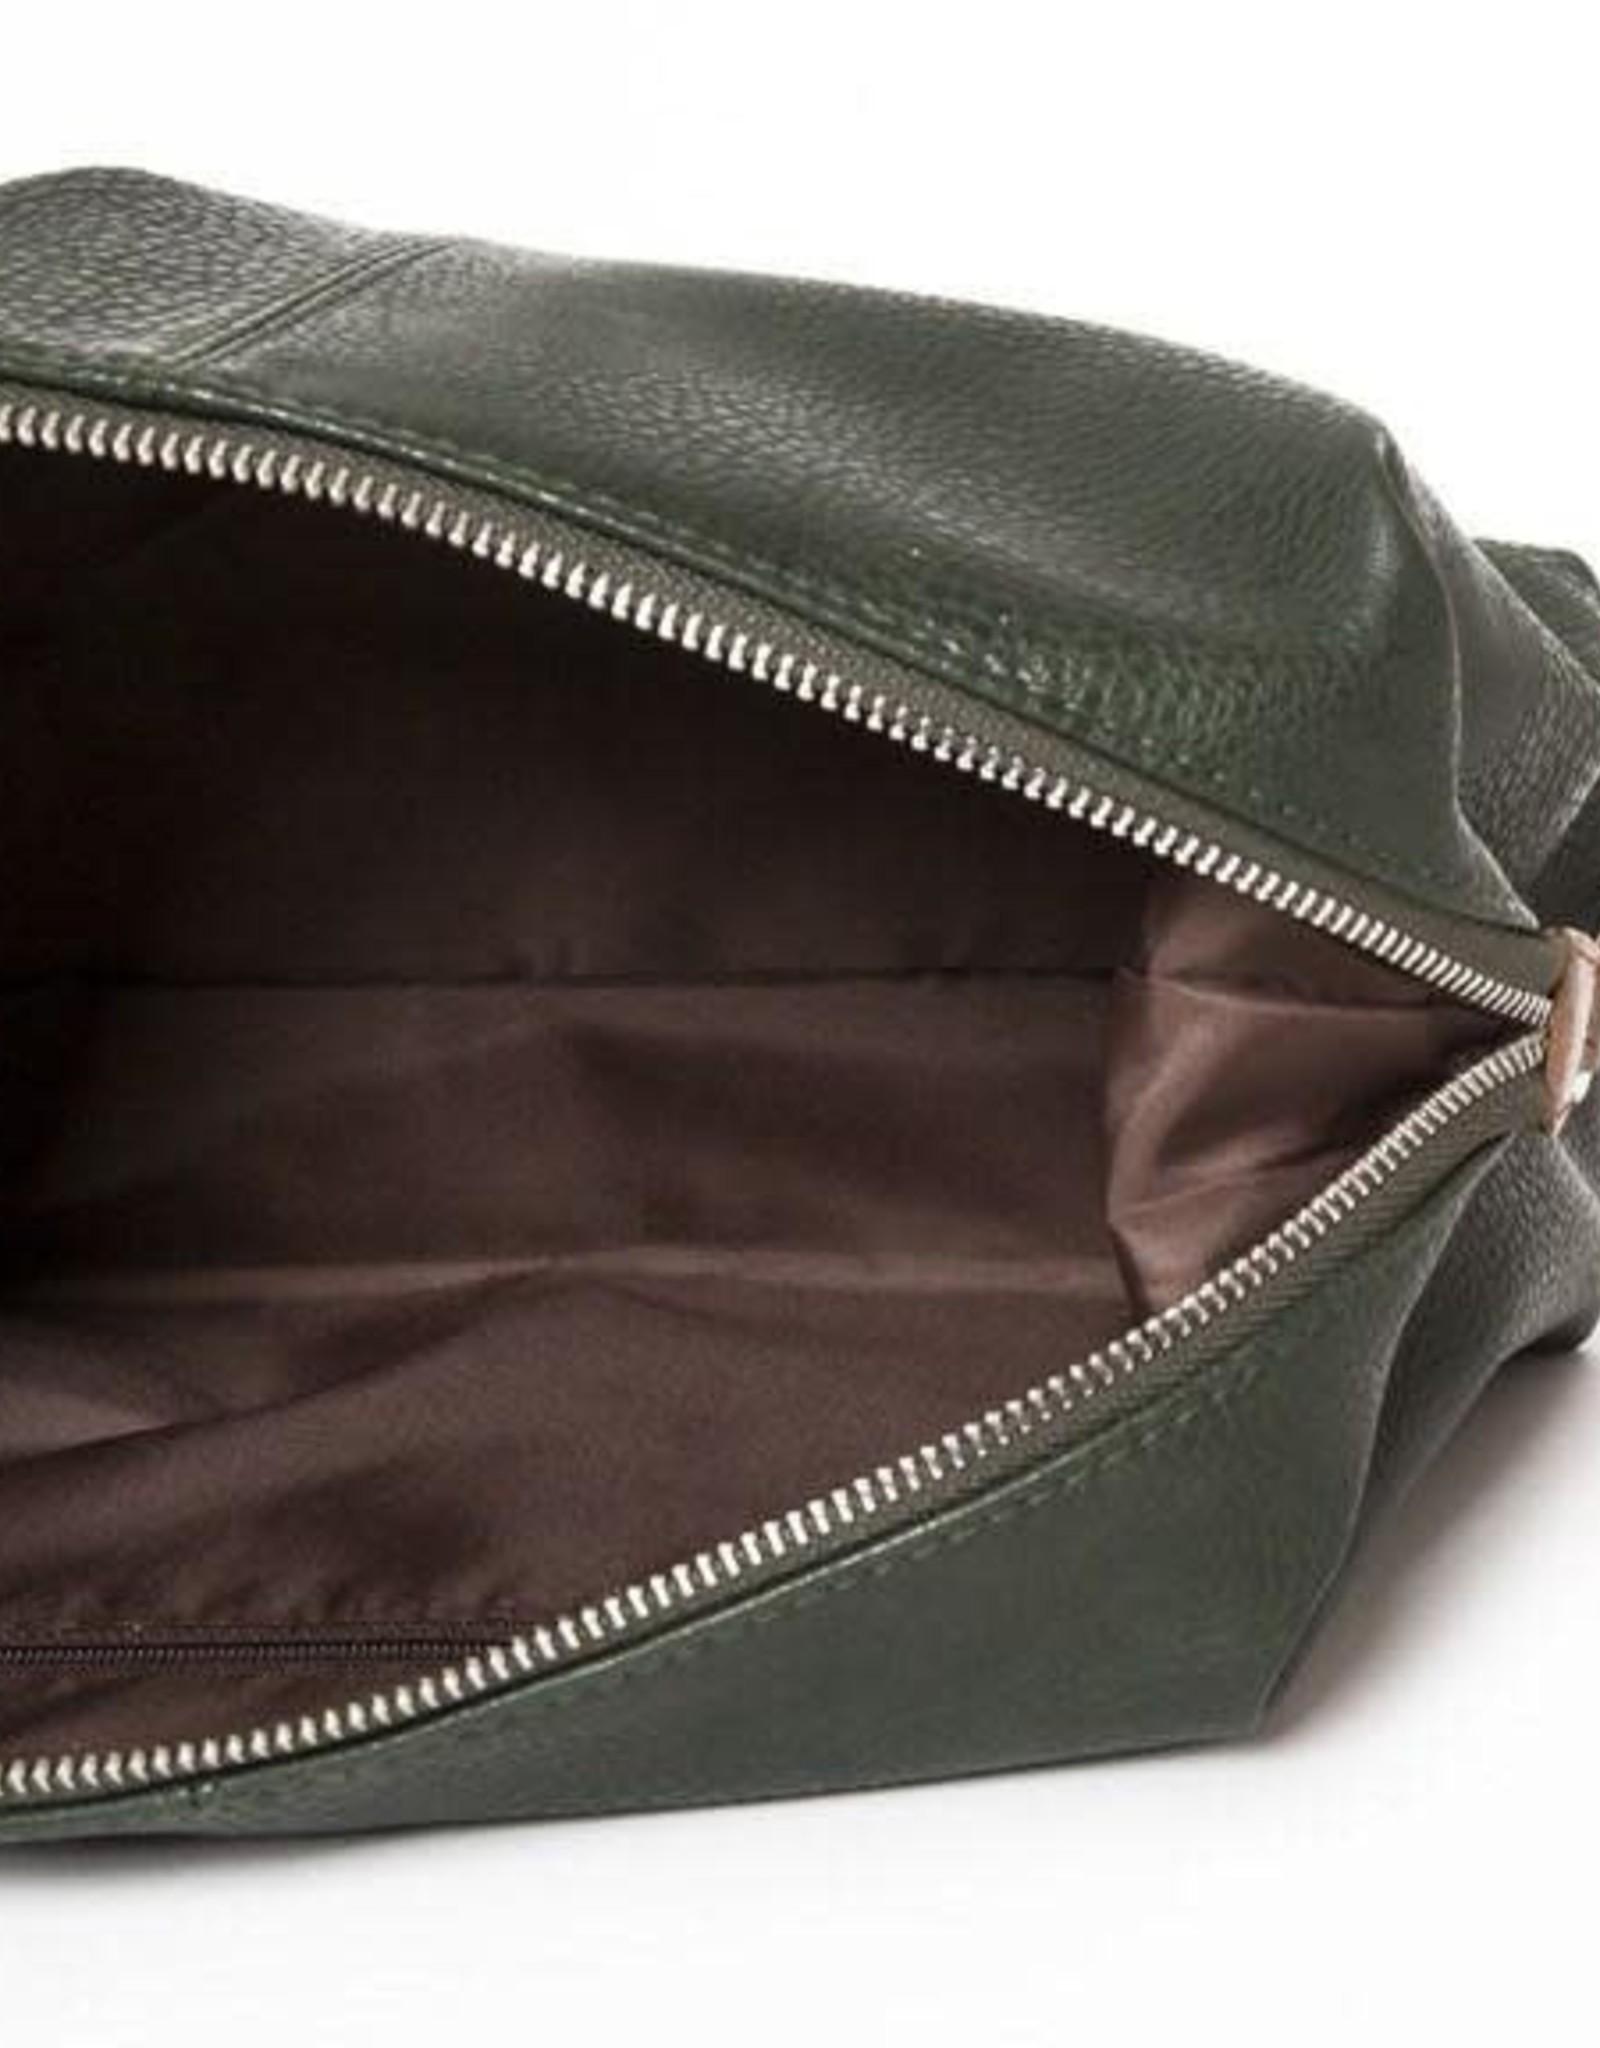 Brouk & Co Alpha Dopp Kit Green